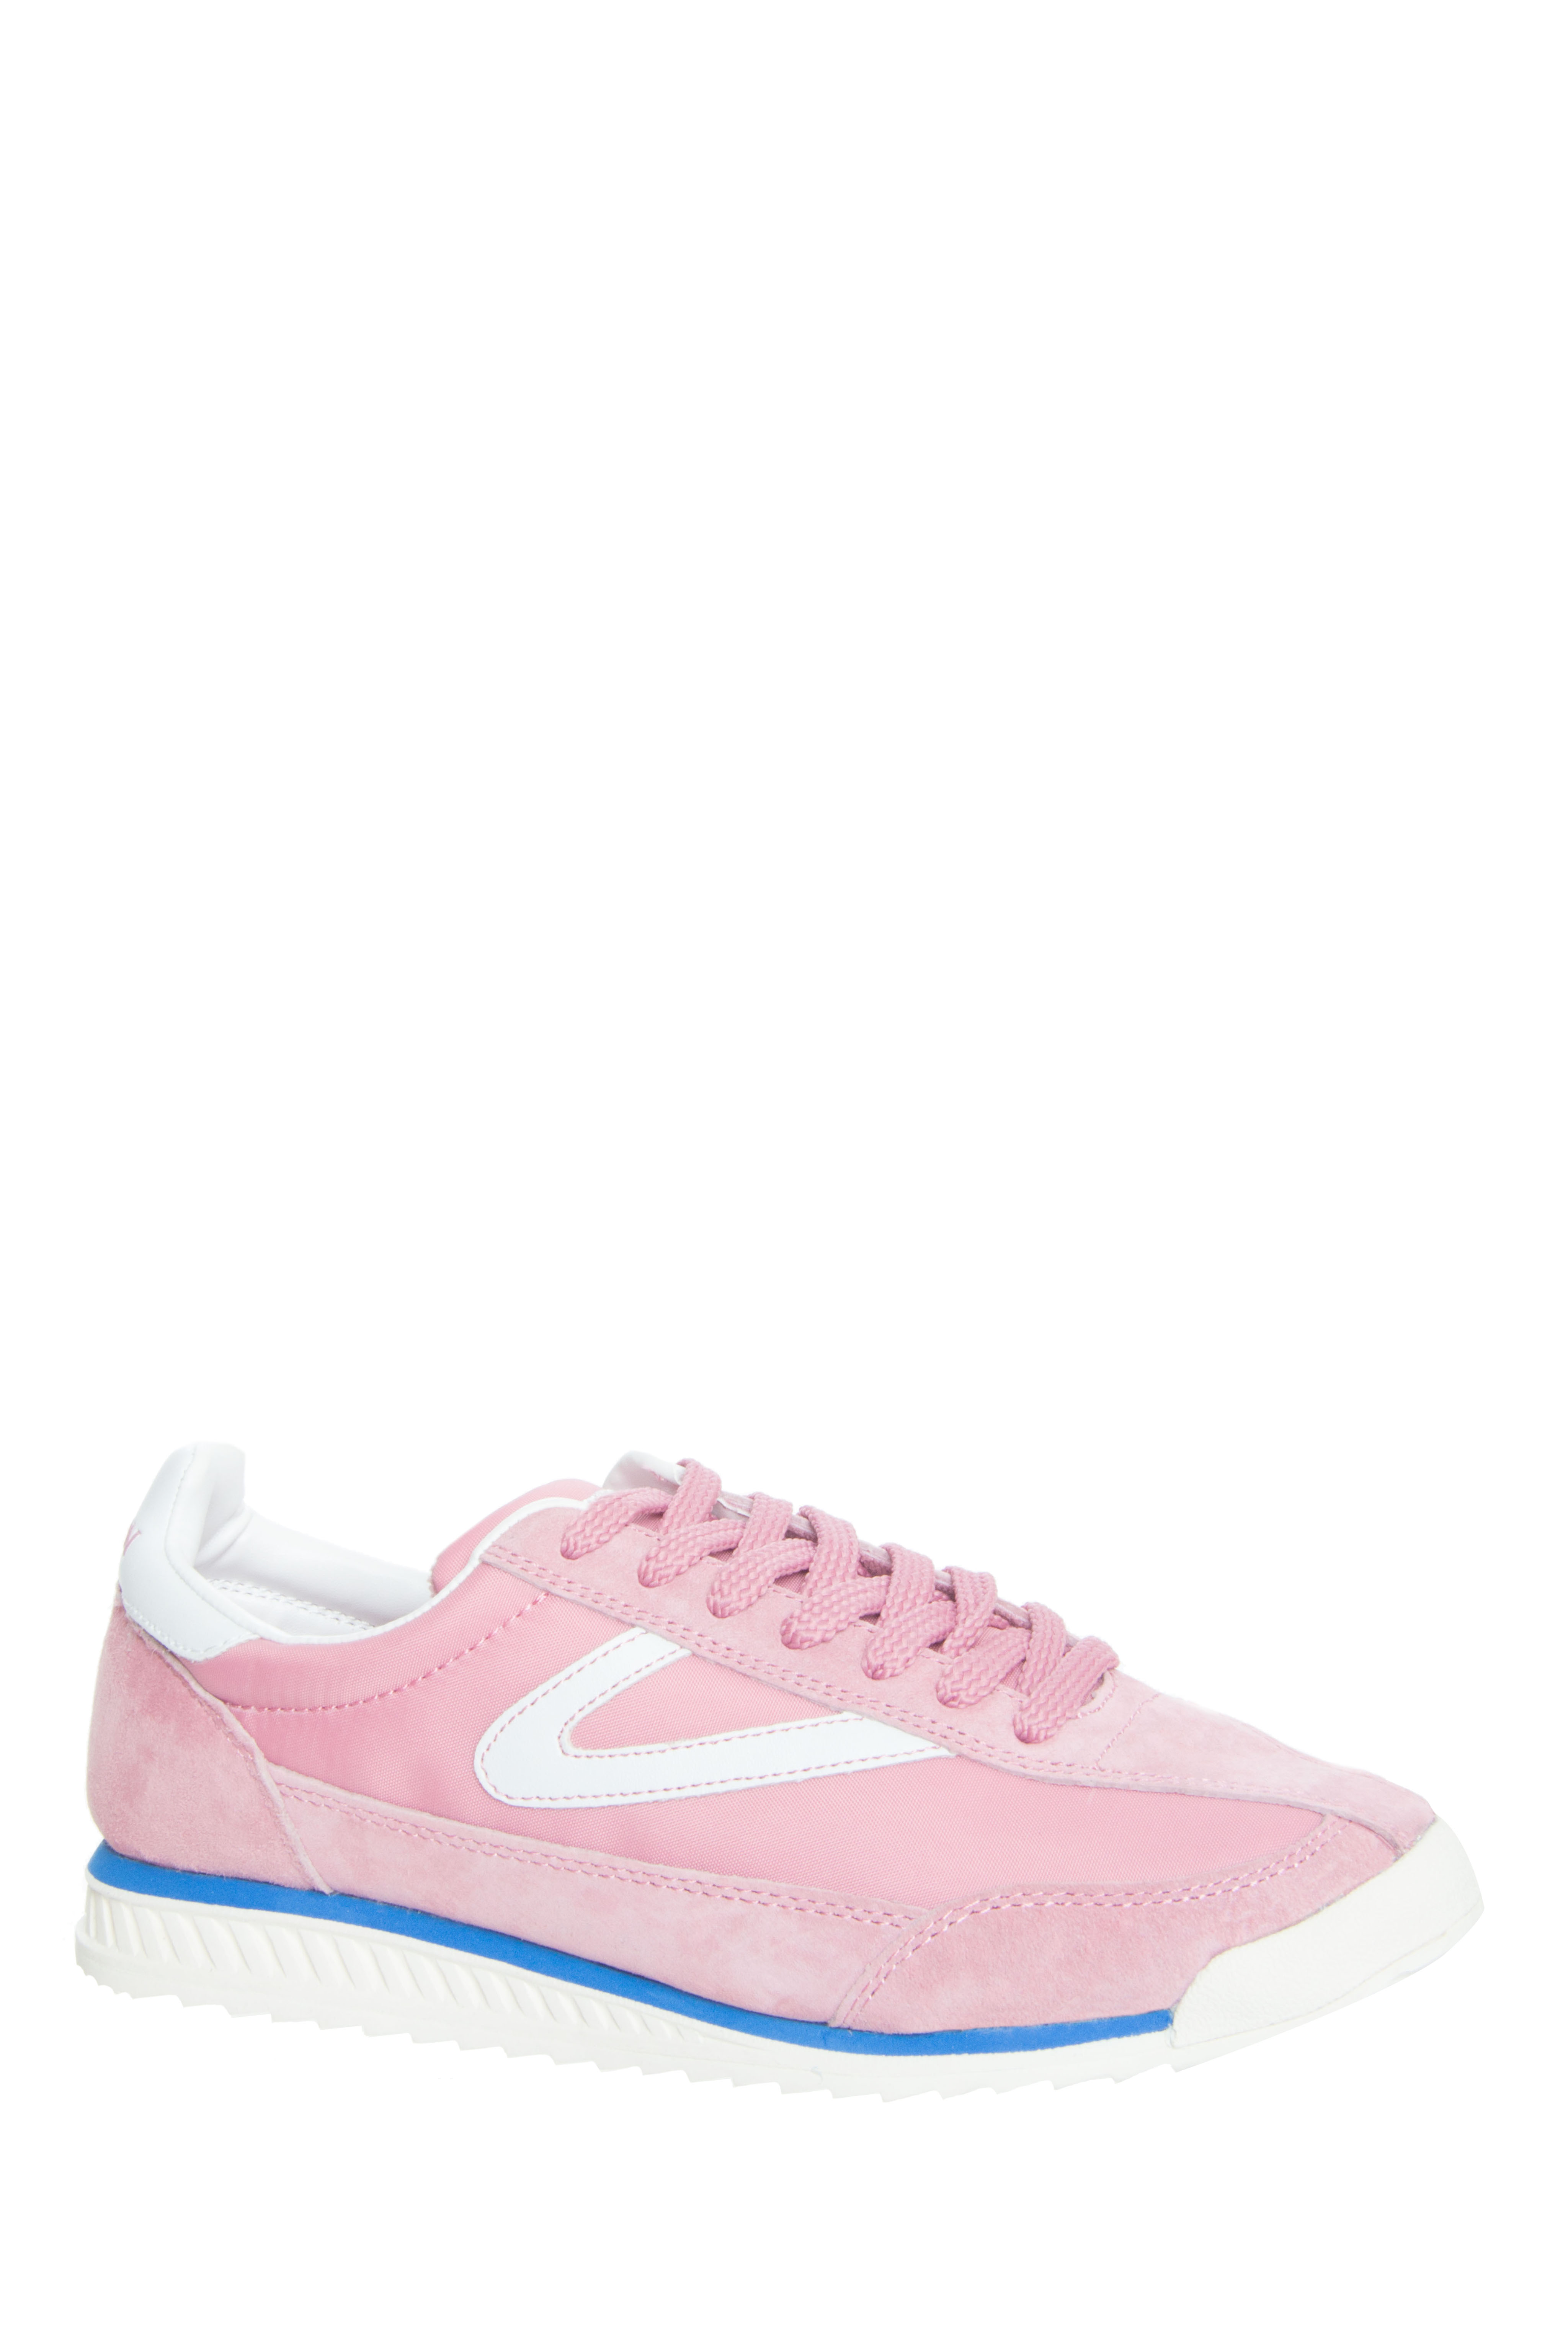 Tretorn Rawlins Low Top Sneakers - Pink